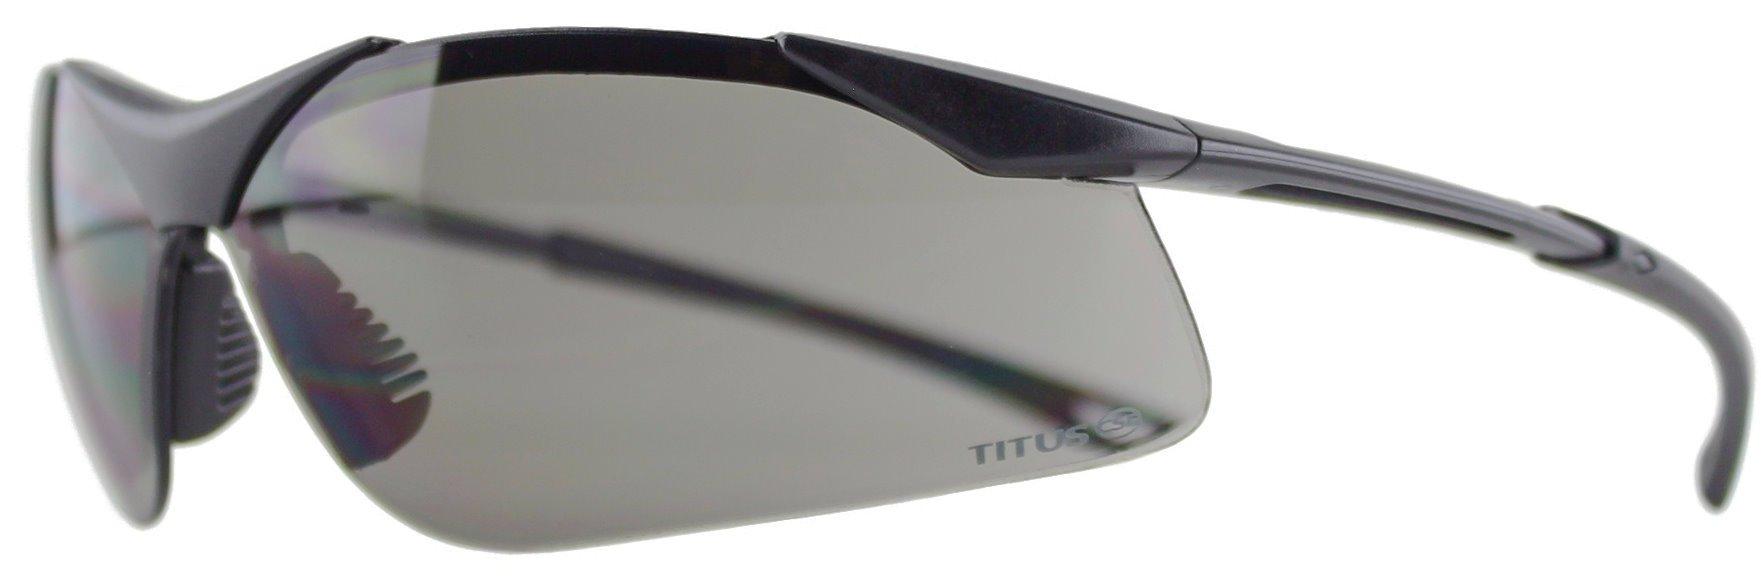 TITUS Top Combos: Safety Earmuffs & Glasses (Black Electronic - Slim, G28 Smoke EMT Professional Glasses)